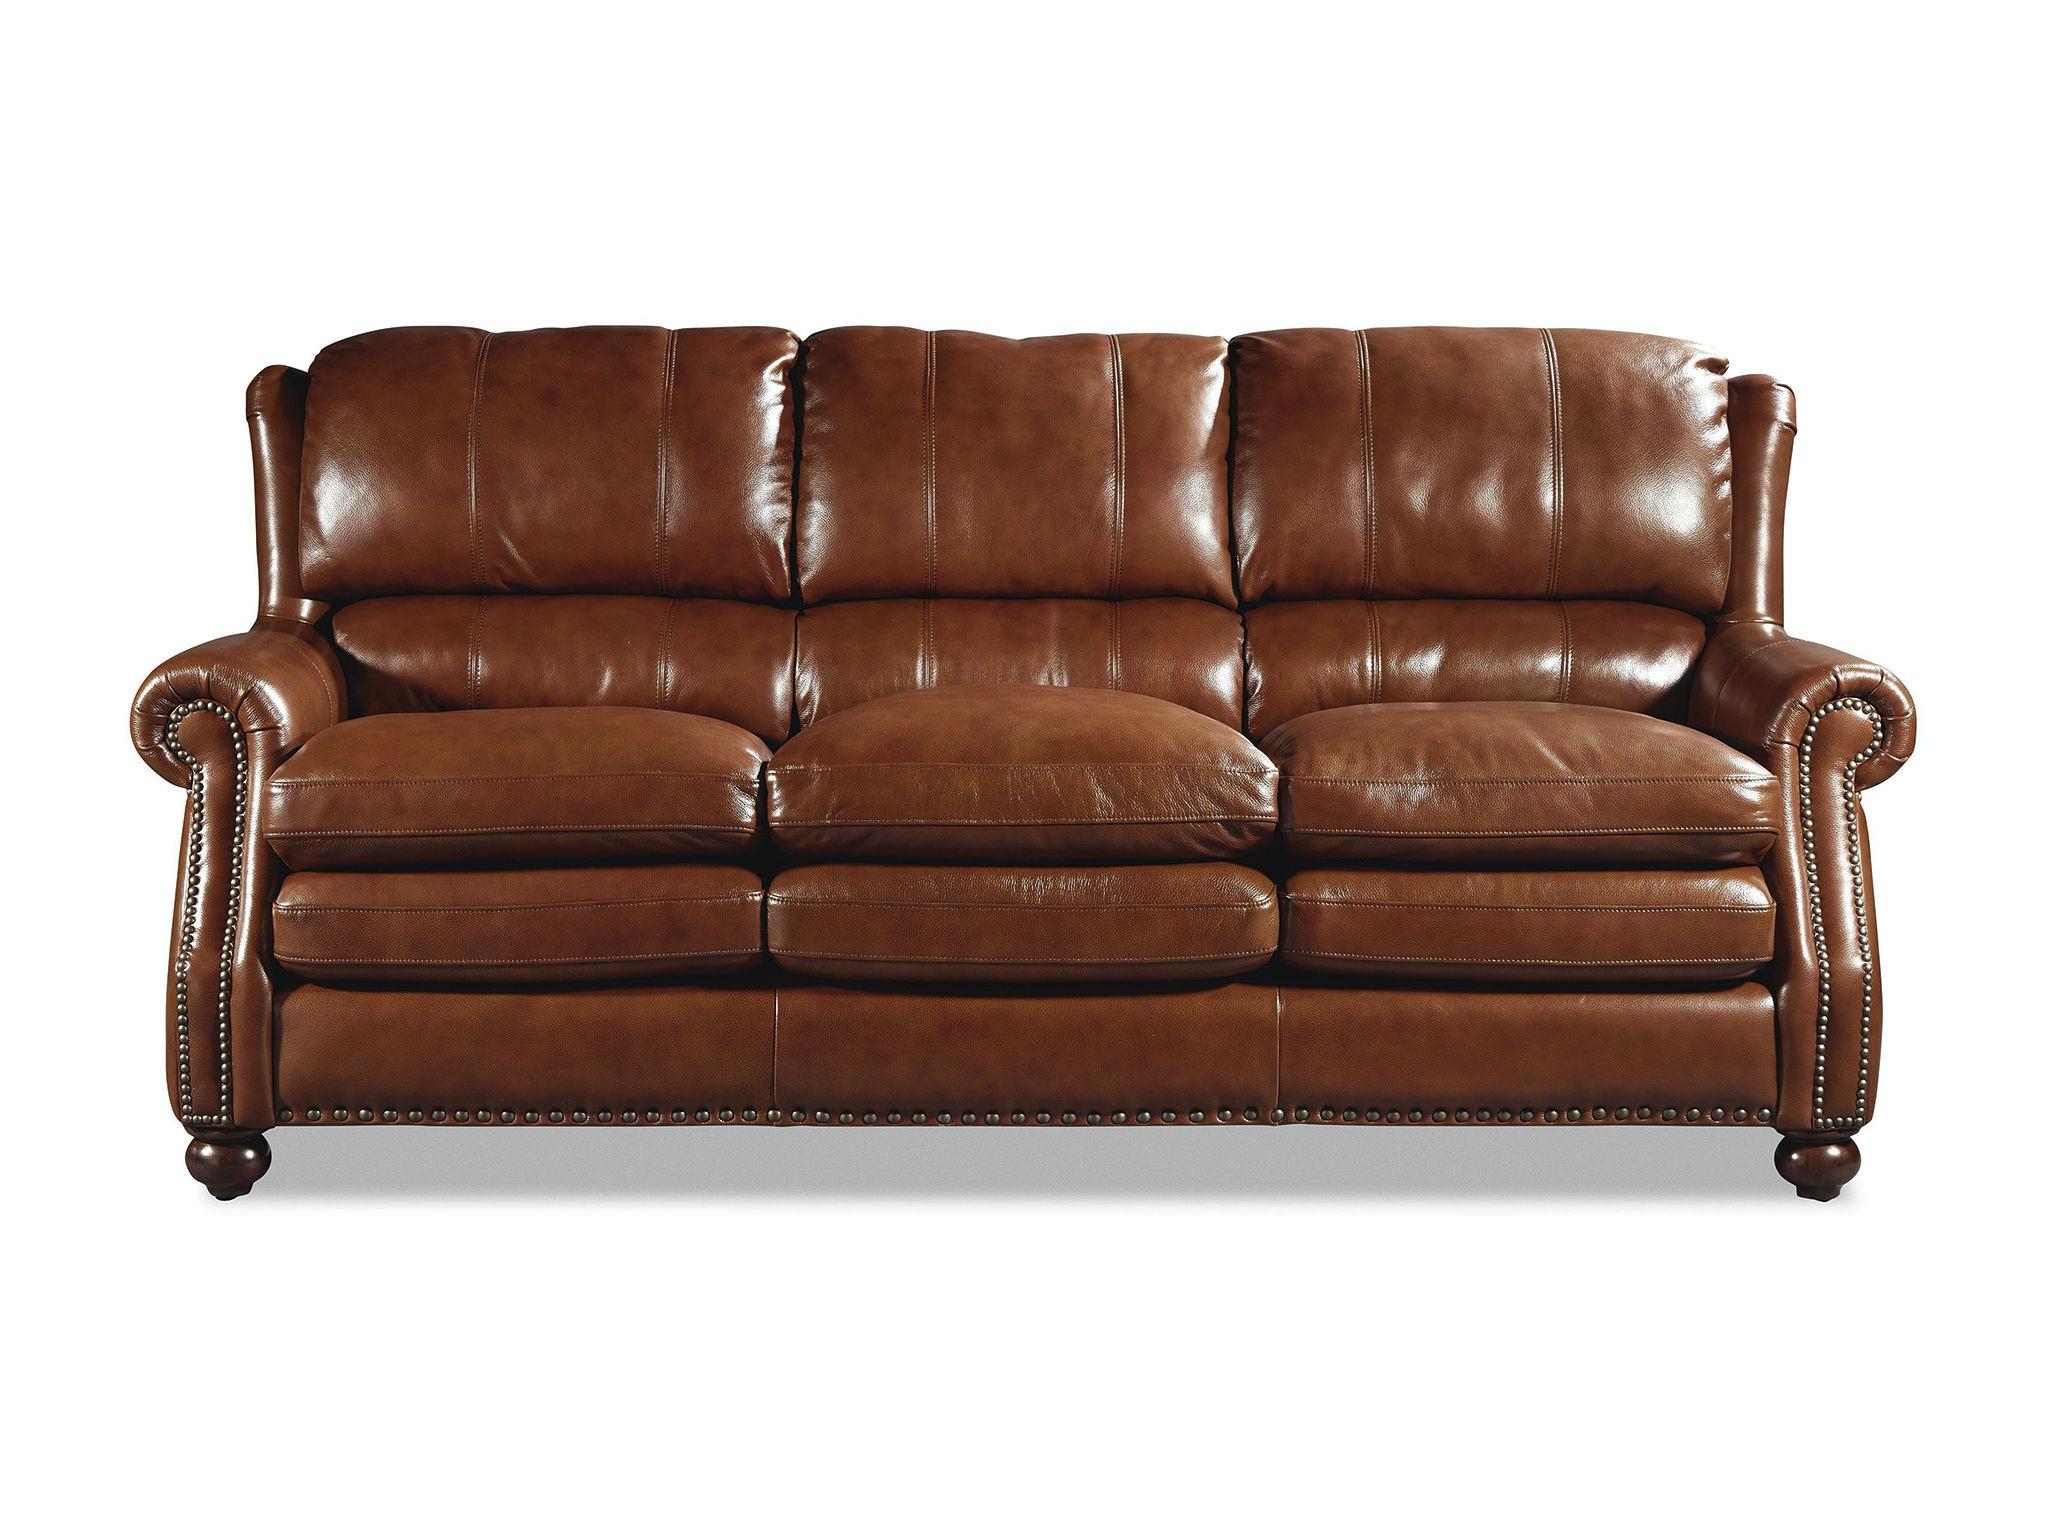 Craftmaster Living Room Sofa L164650   Ramsey Furniture Company   Covington  And Atlanta, GA